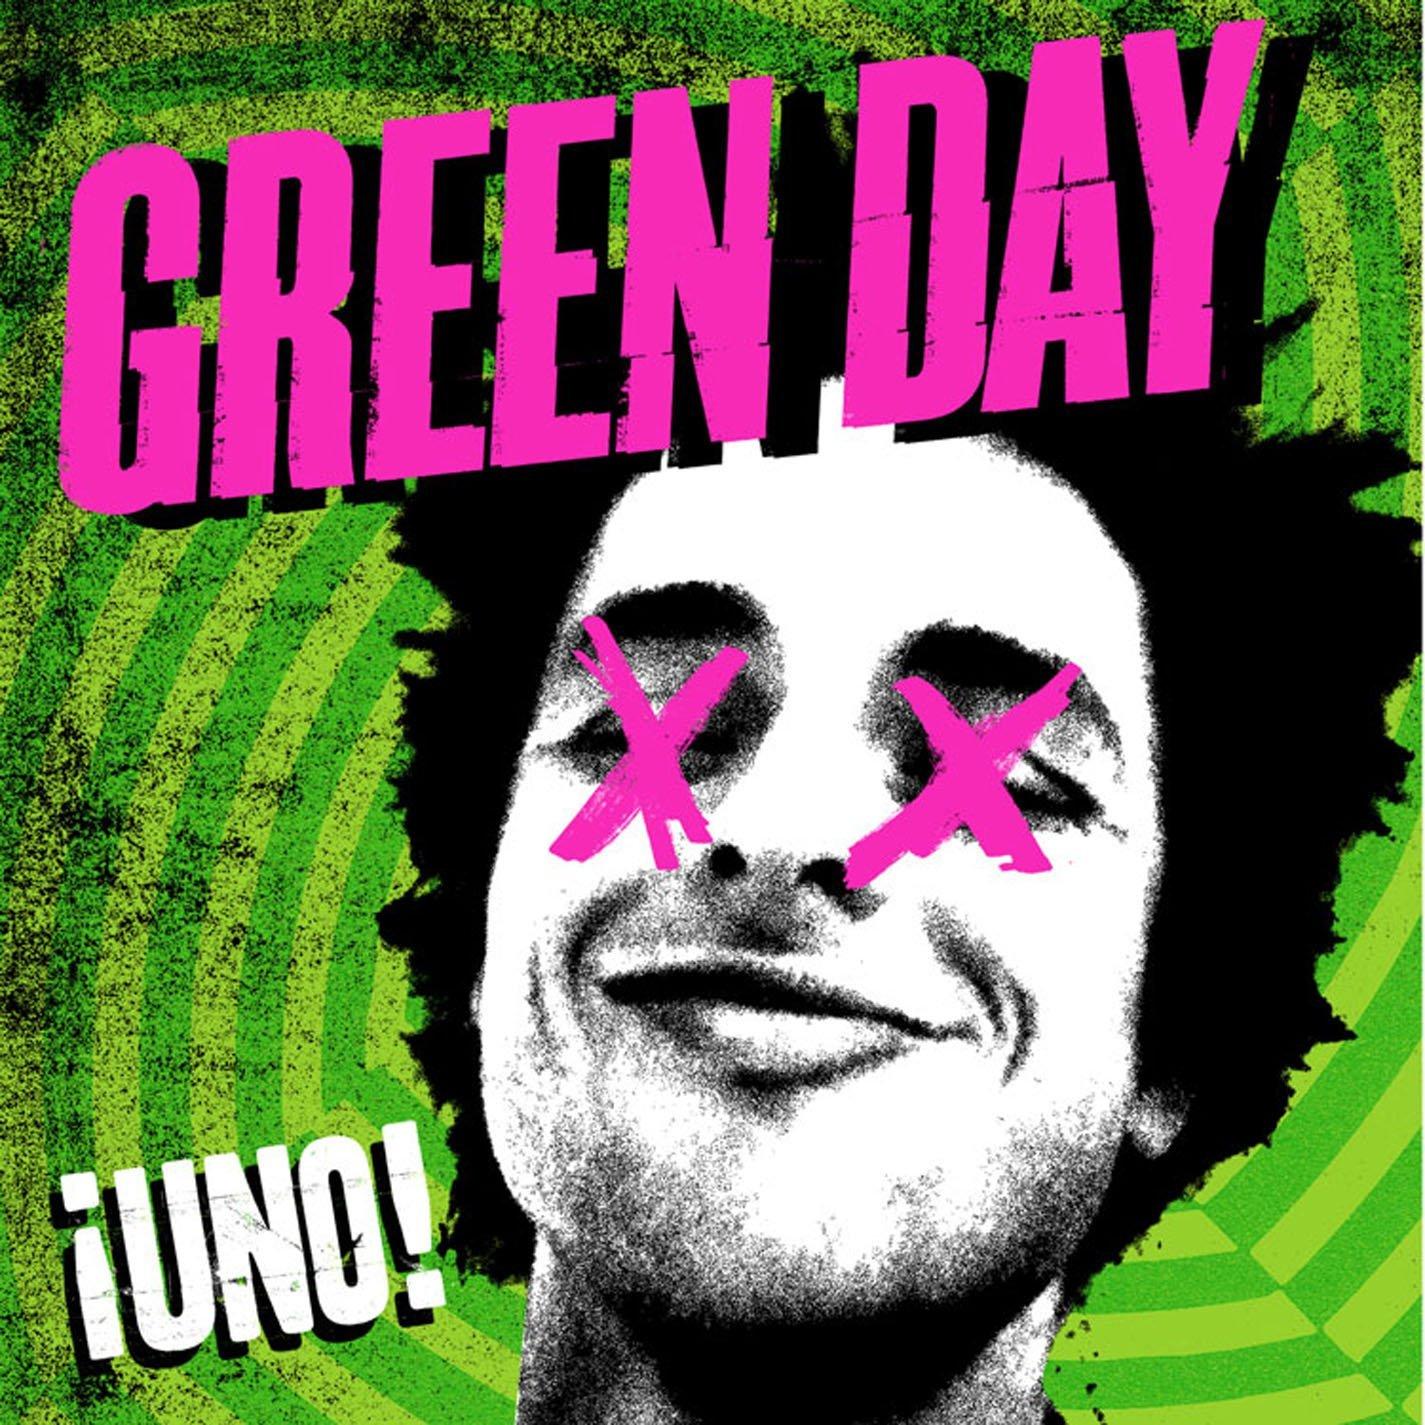 Green Day, ¡Uno! | Album Review